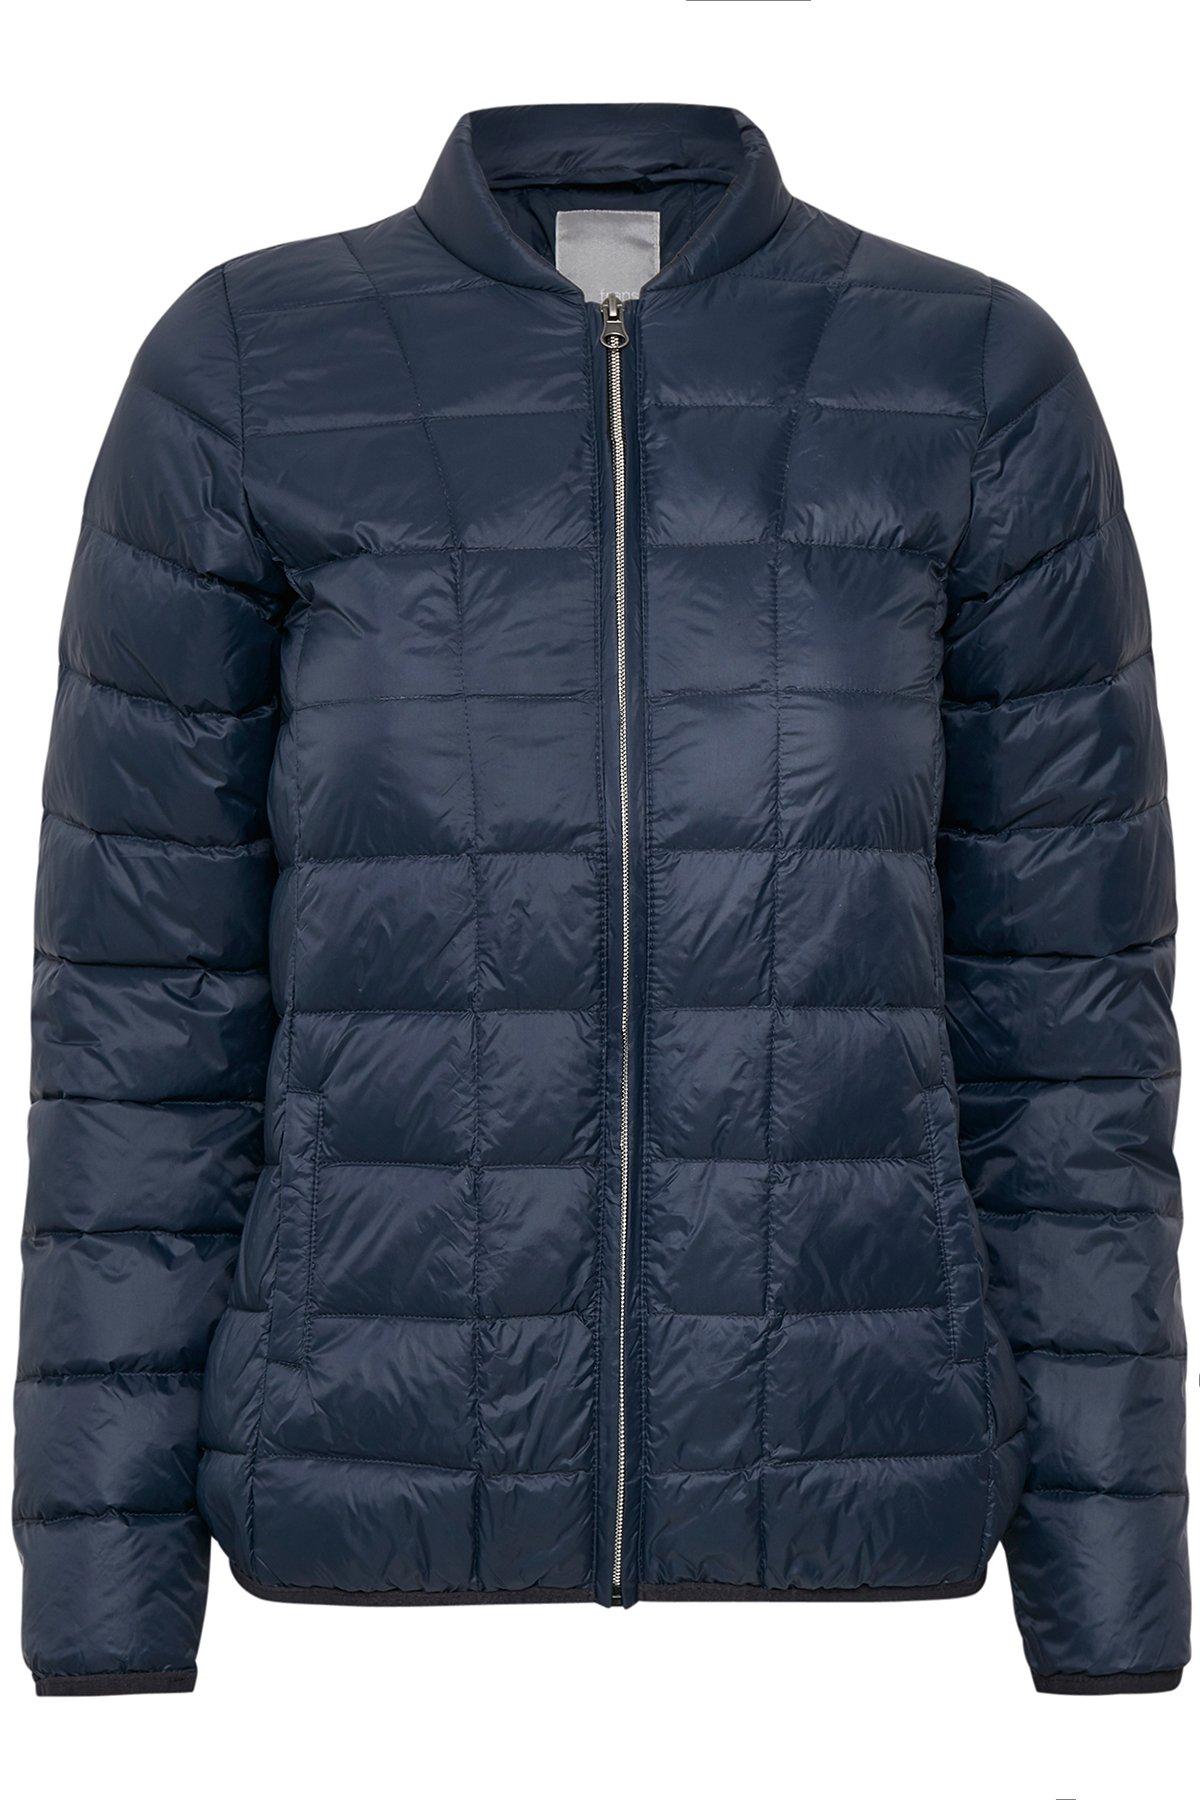 Marineblå Frakke fra Fransa – Køb Marineblå Frakke fra str. XS-XXL her